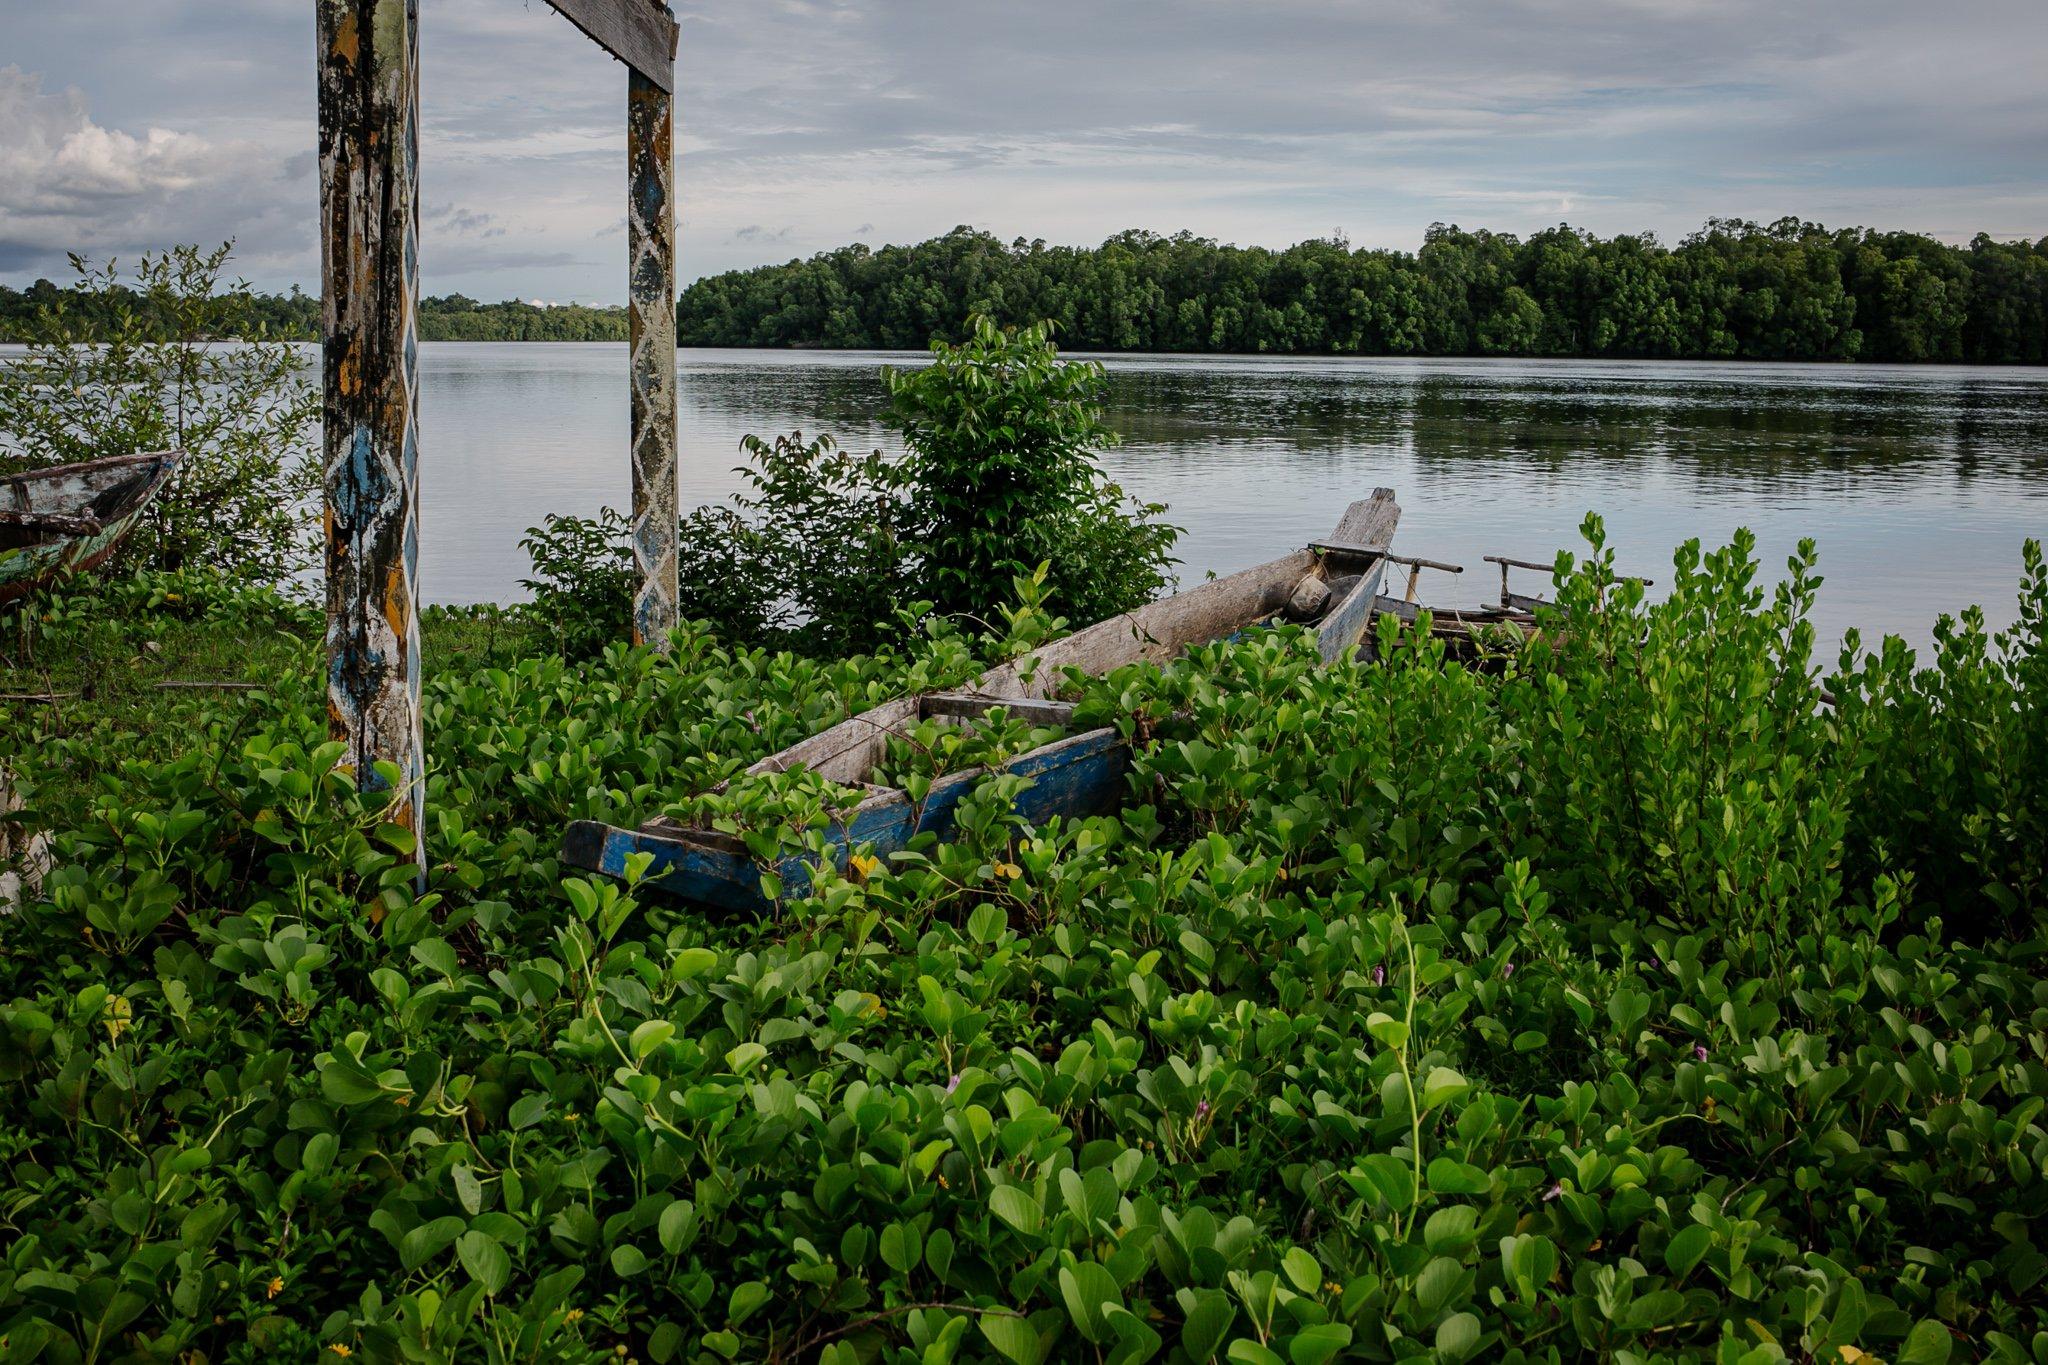 Bangkai perahu di Distrik Segun, Kabupaten Sorong, Papua Barat, Minggu, (19/9/2021). Terputusnya akses jalan darat membuat masyarakat adat Suku Moi harus menggunakan perahu dan merogoh kocek lebih tinggi sebesar Rp. 100.000 untuk sekali menumpang.